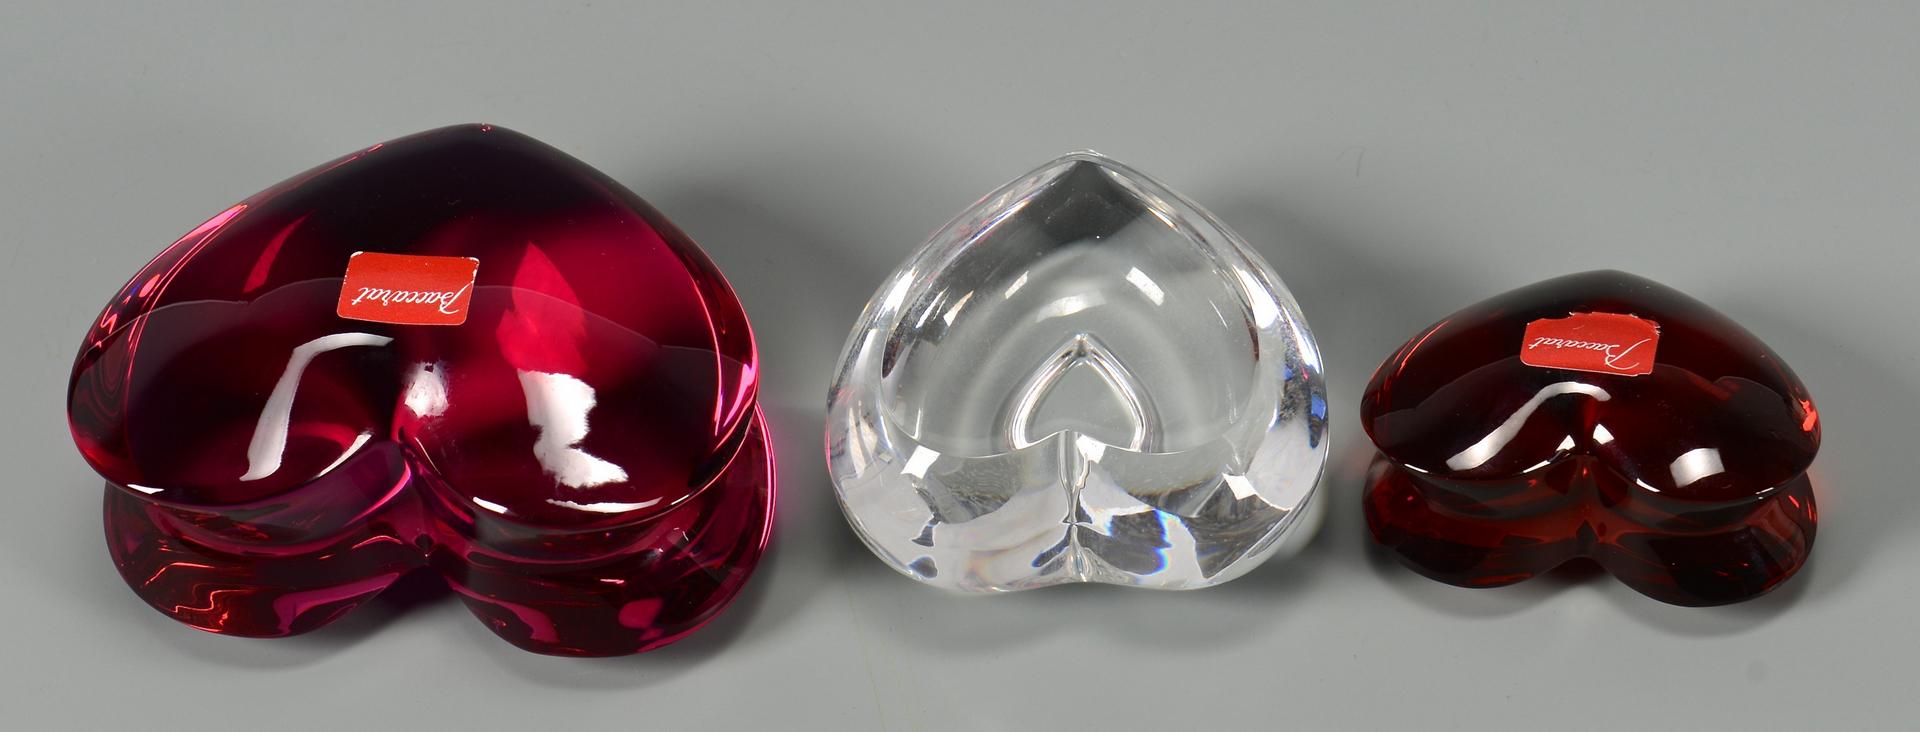 Lot 484: 3 pcs Mid-Century Art Glass + 5 small paperweights